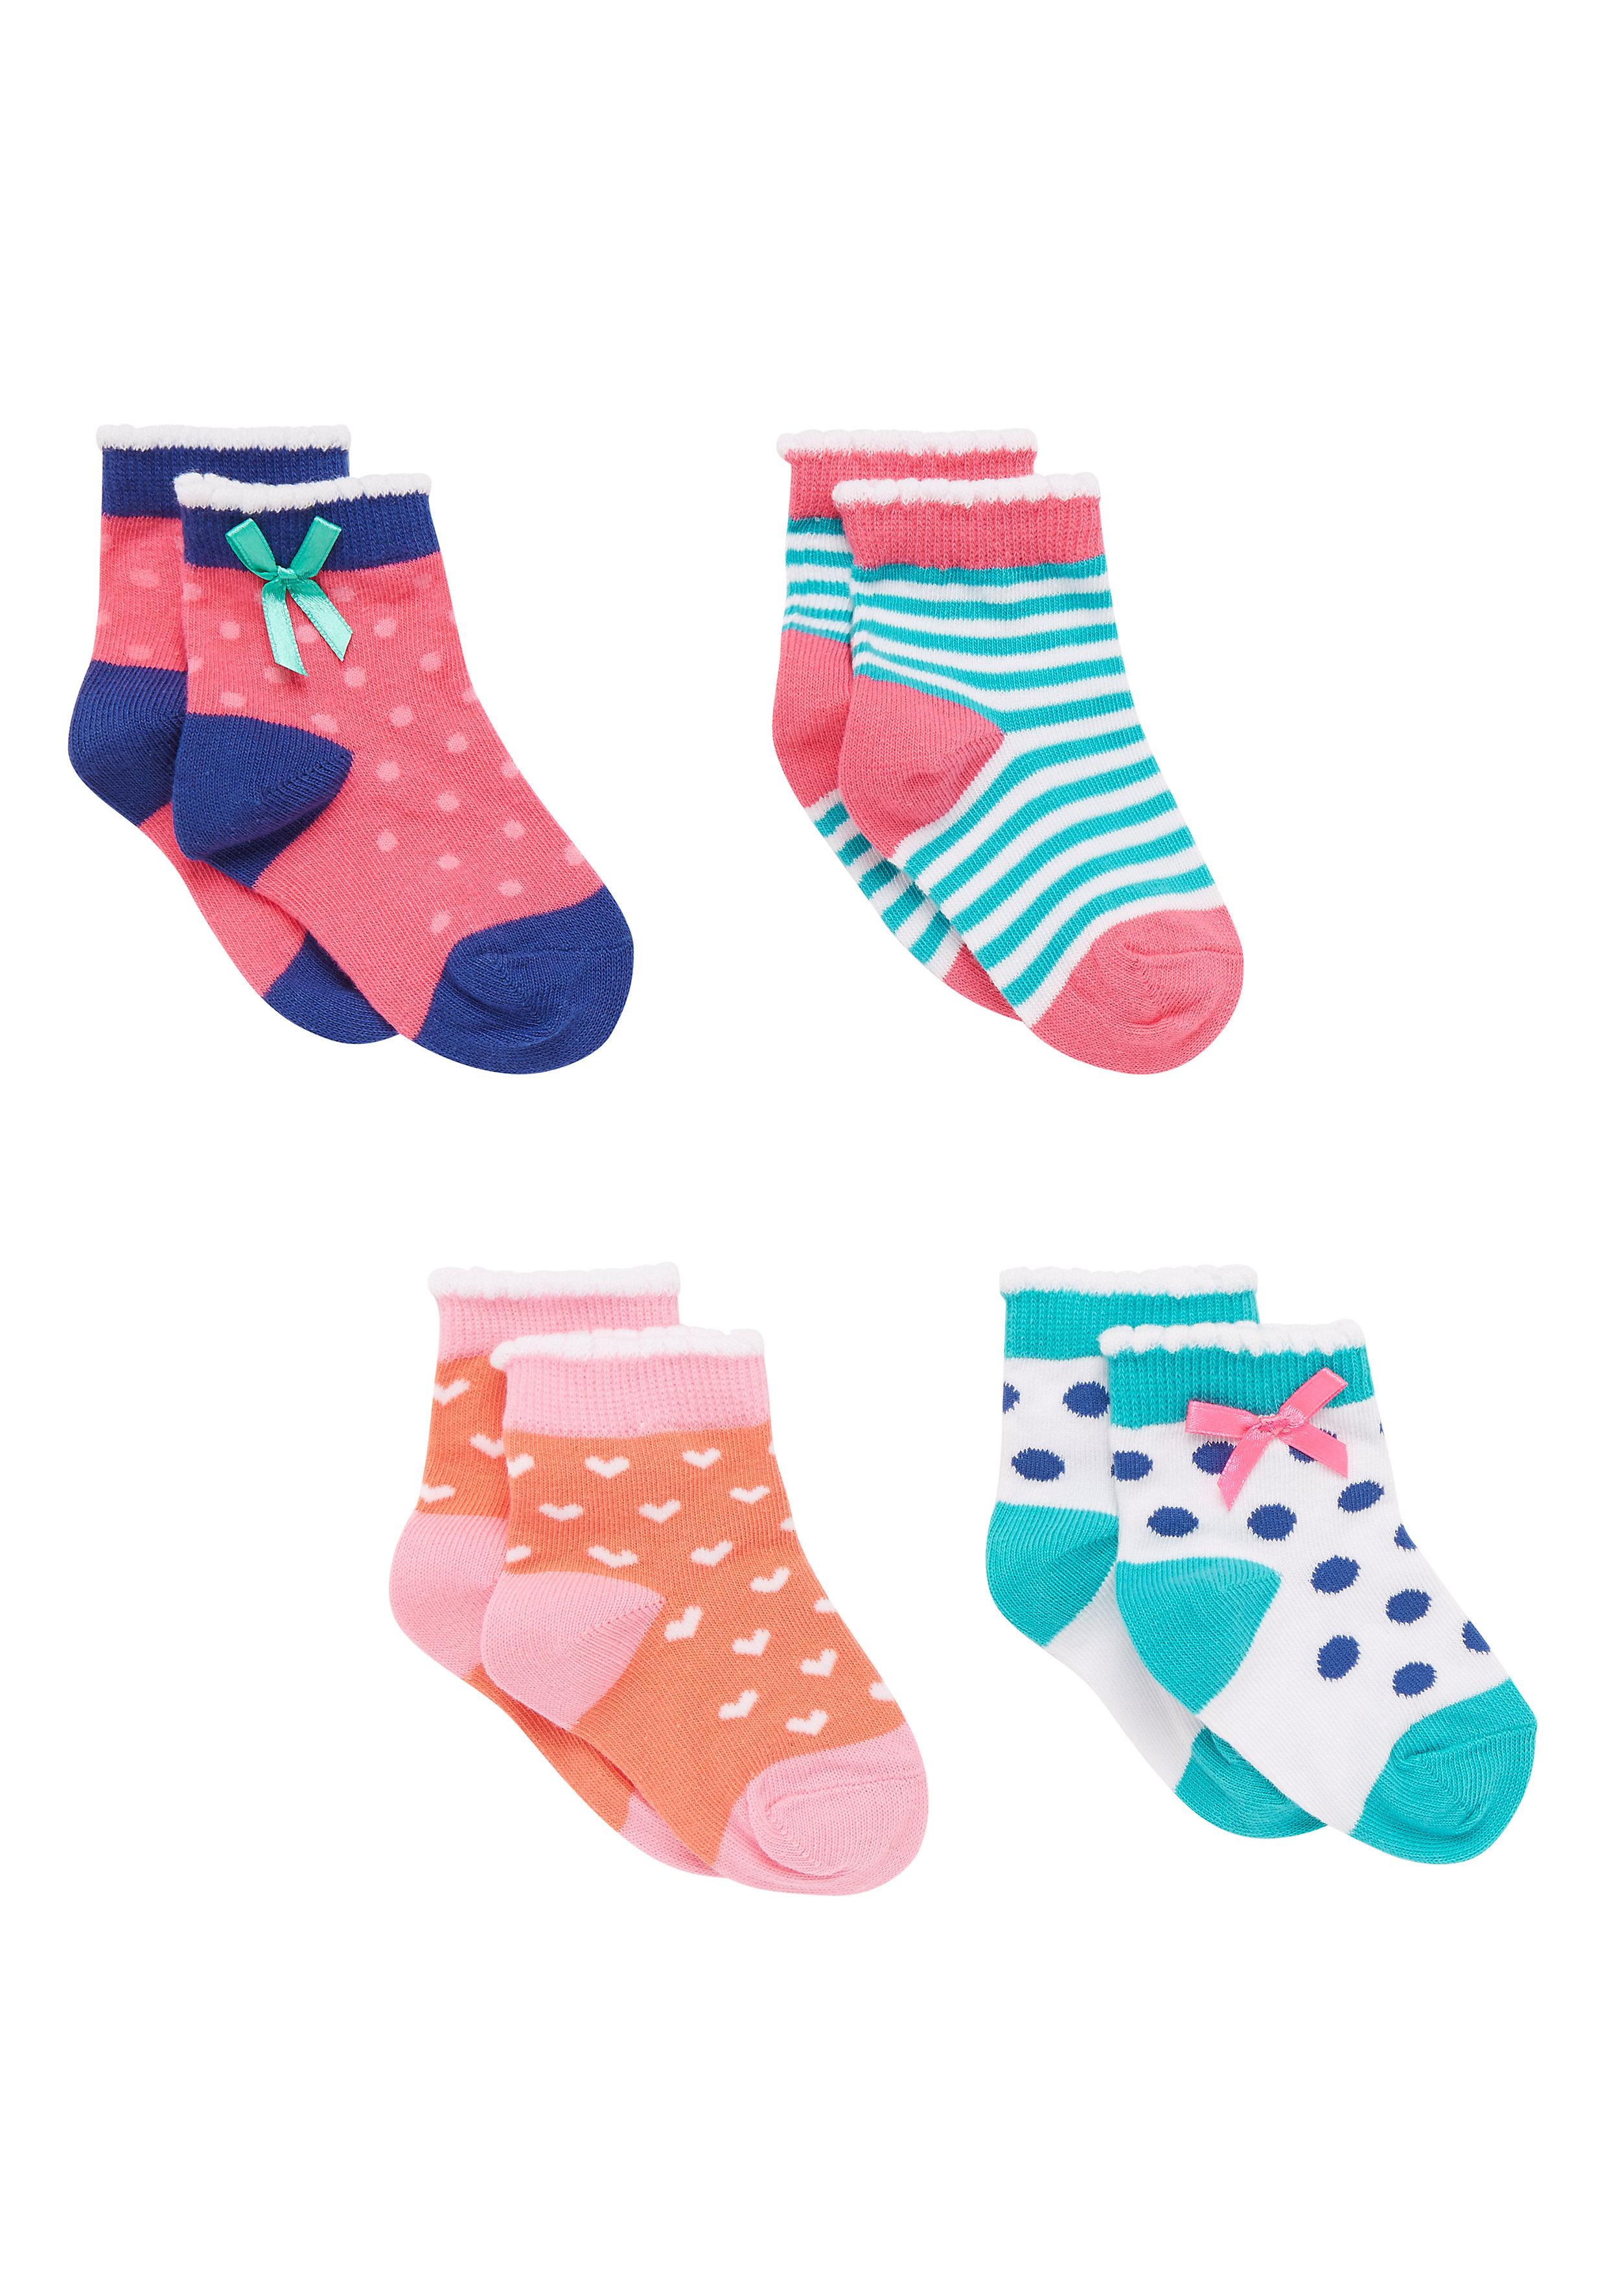 Mothercare | Girls Socks Stripe And Spot Design - Pack Of 4 - Multicolor